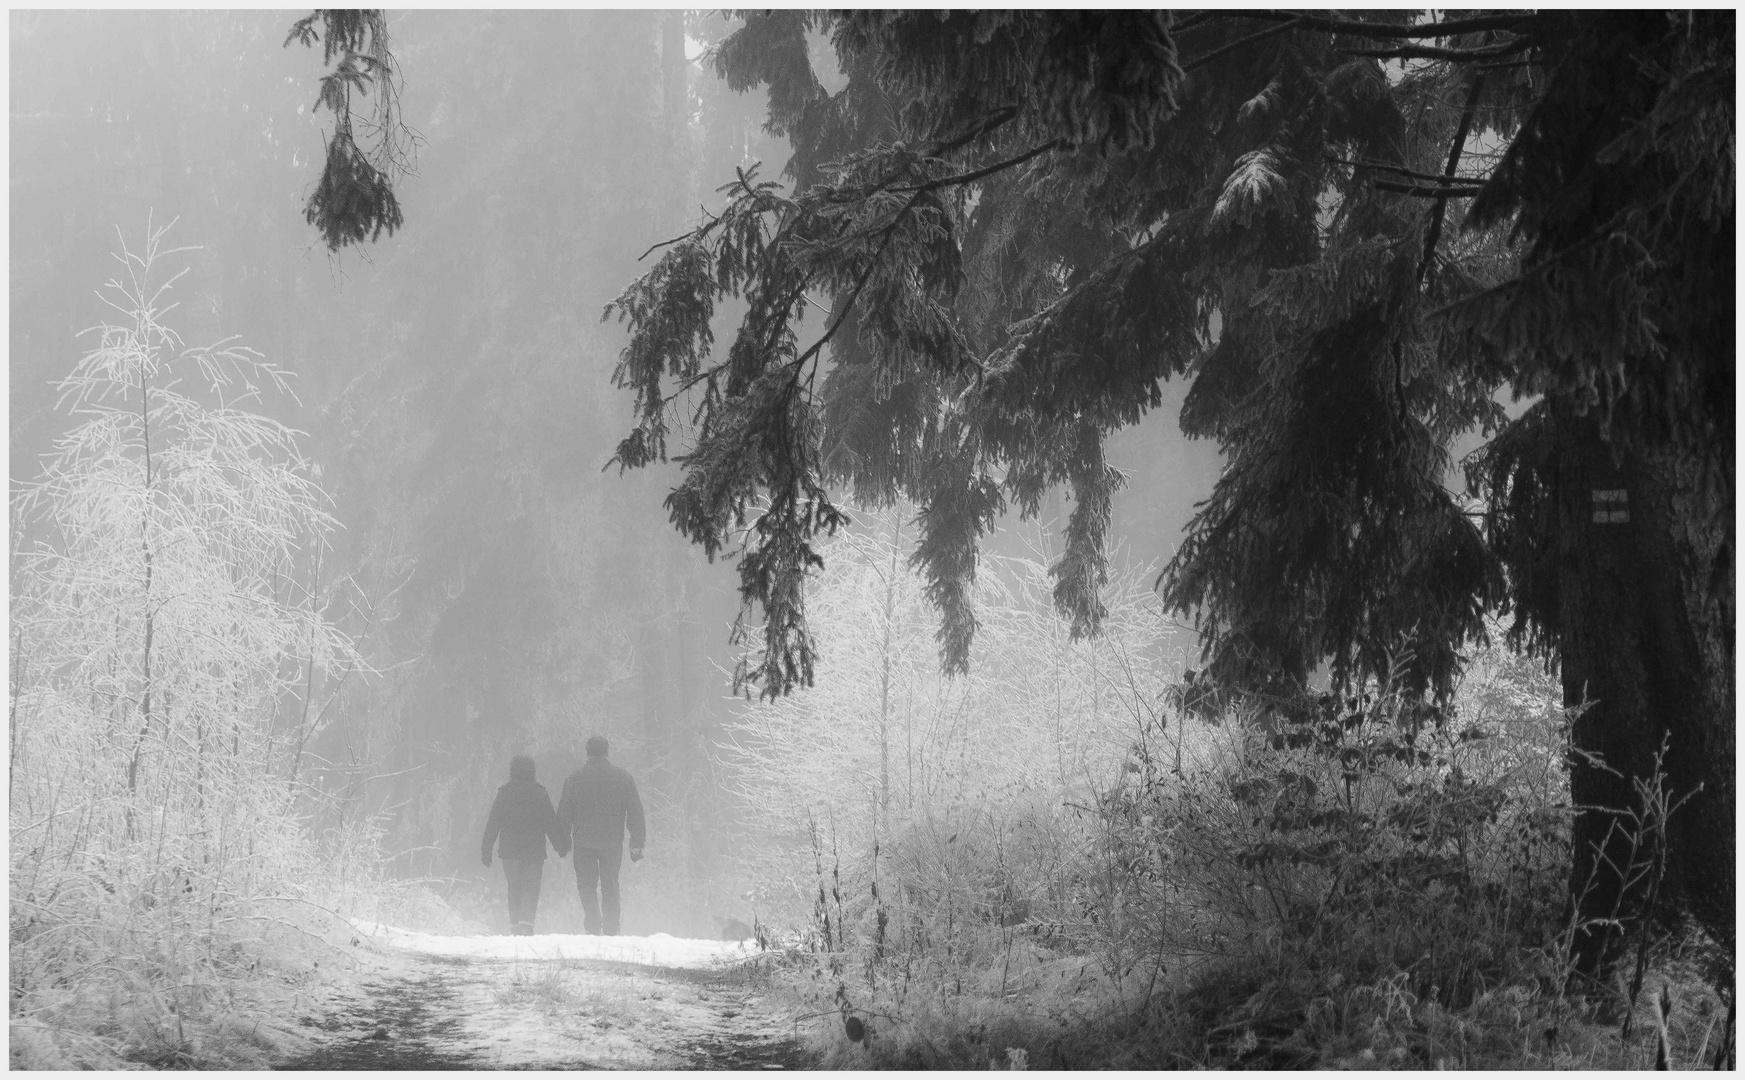 ...den Weg gemeinsam gehen